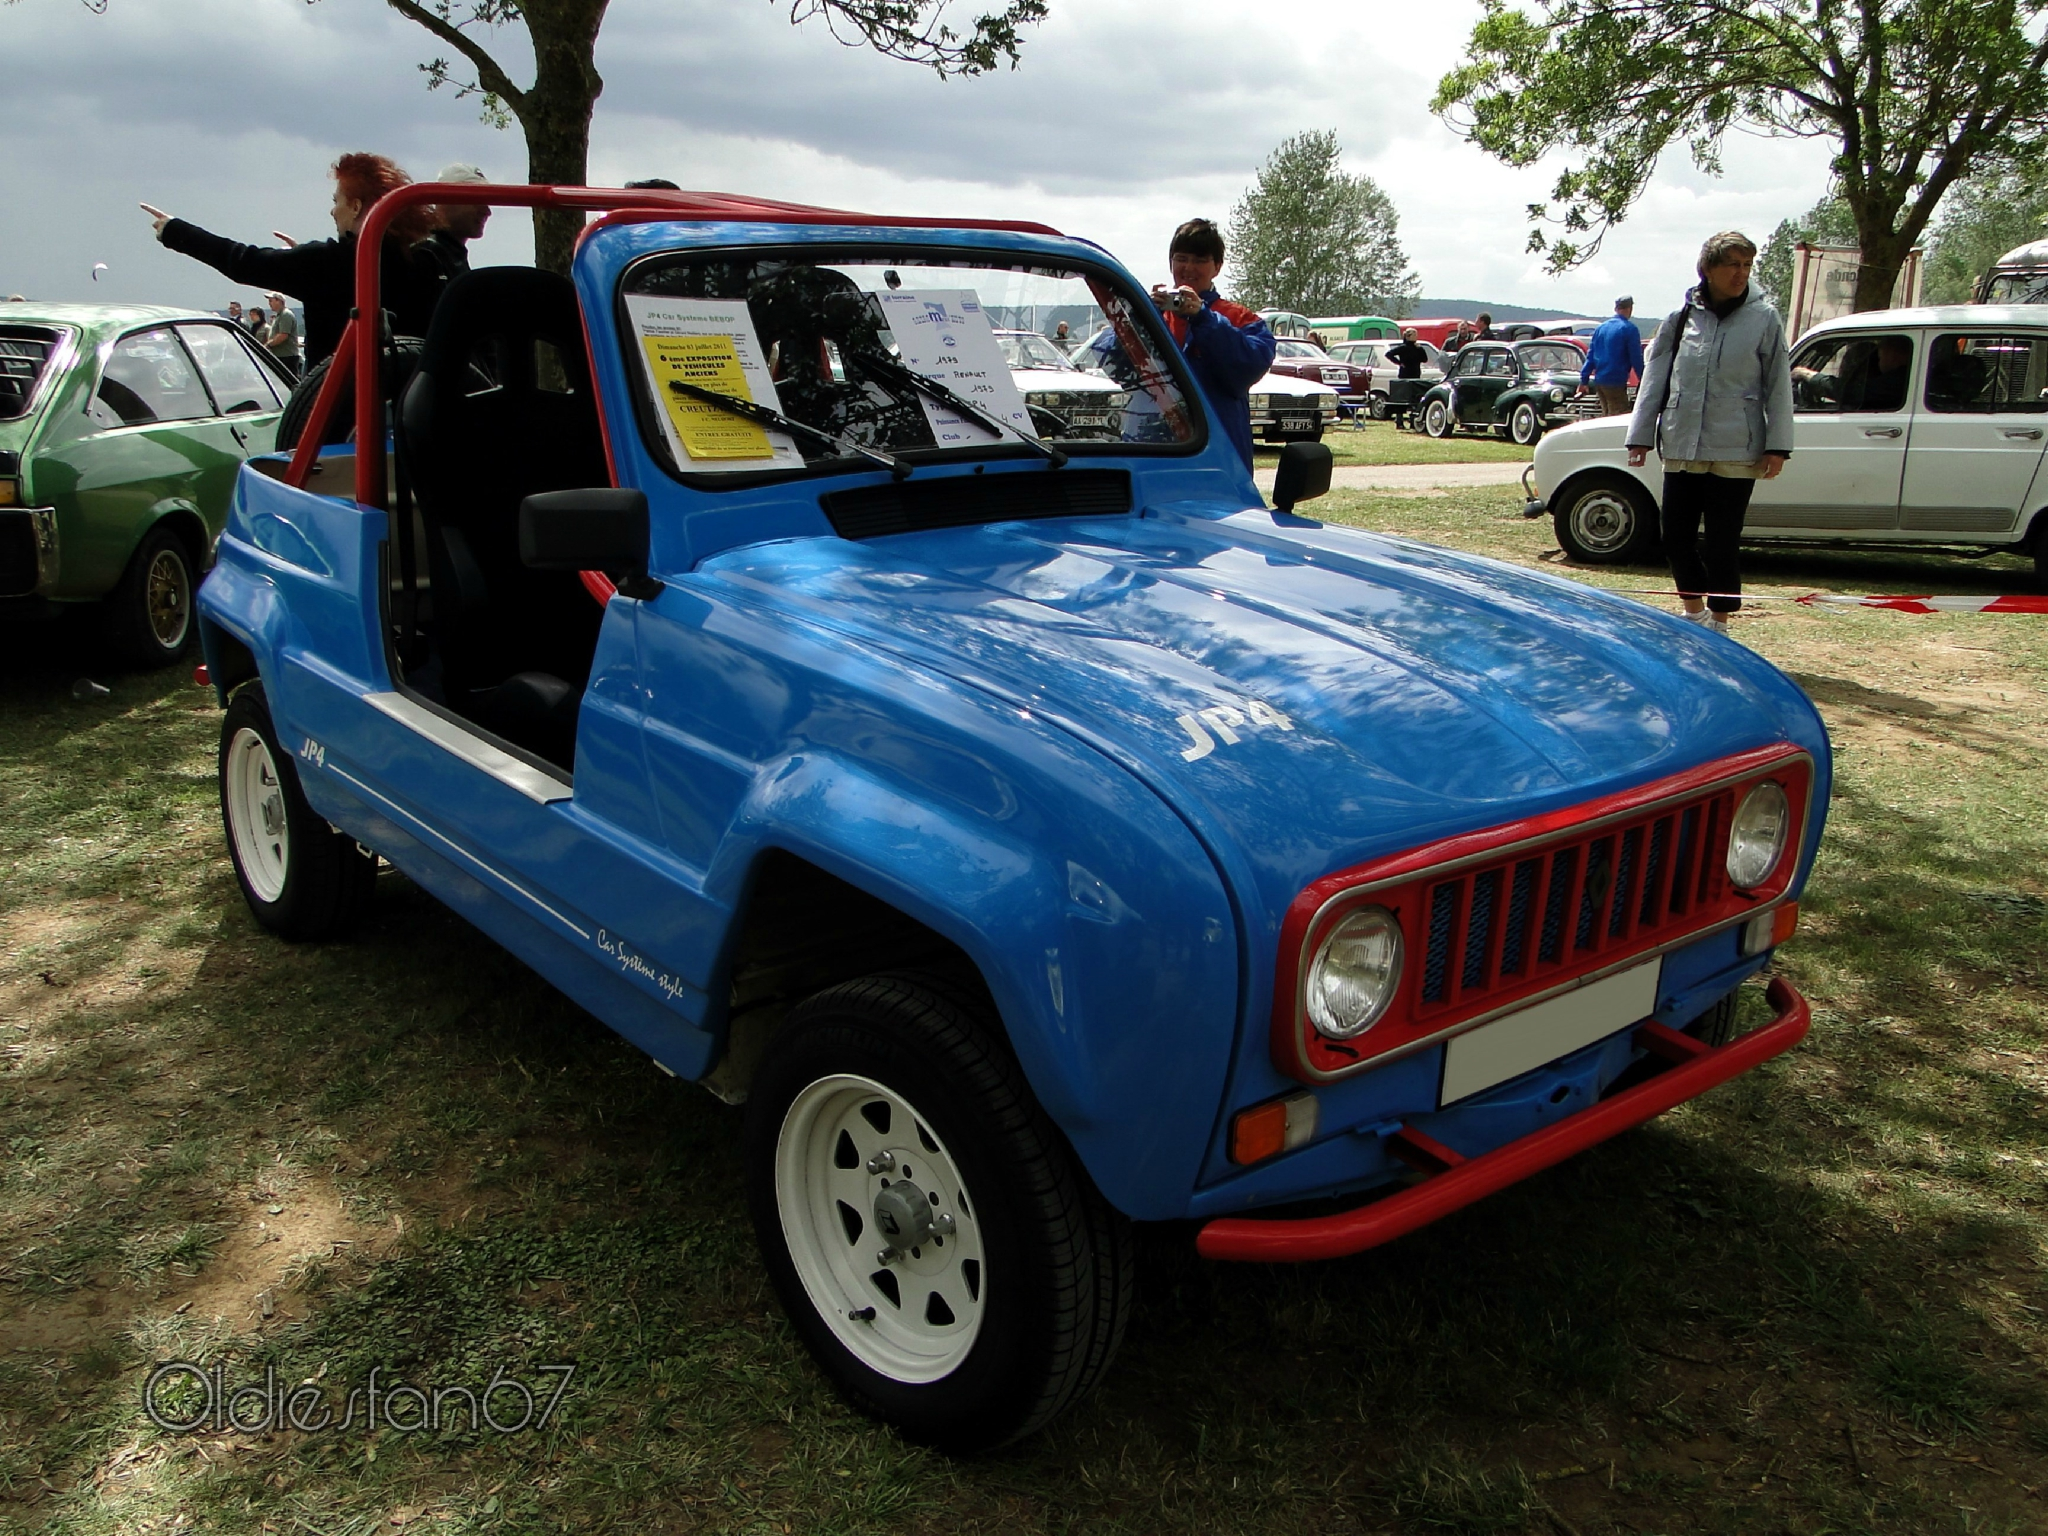 "Renault JP4 - 1979 - Oldiesfan67 ""Mon blog auto"""